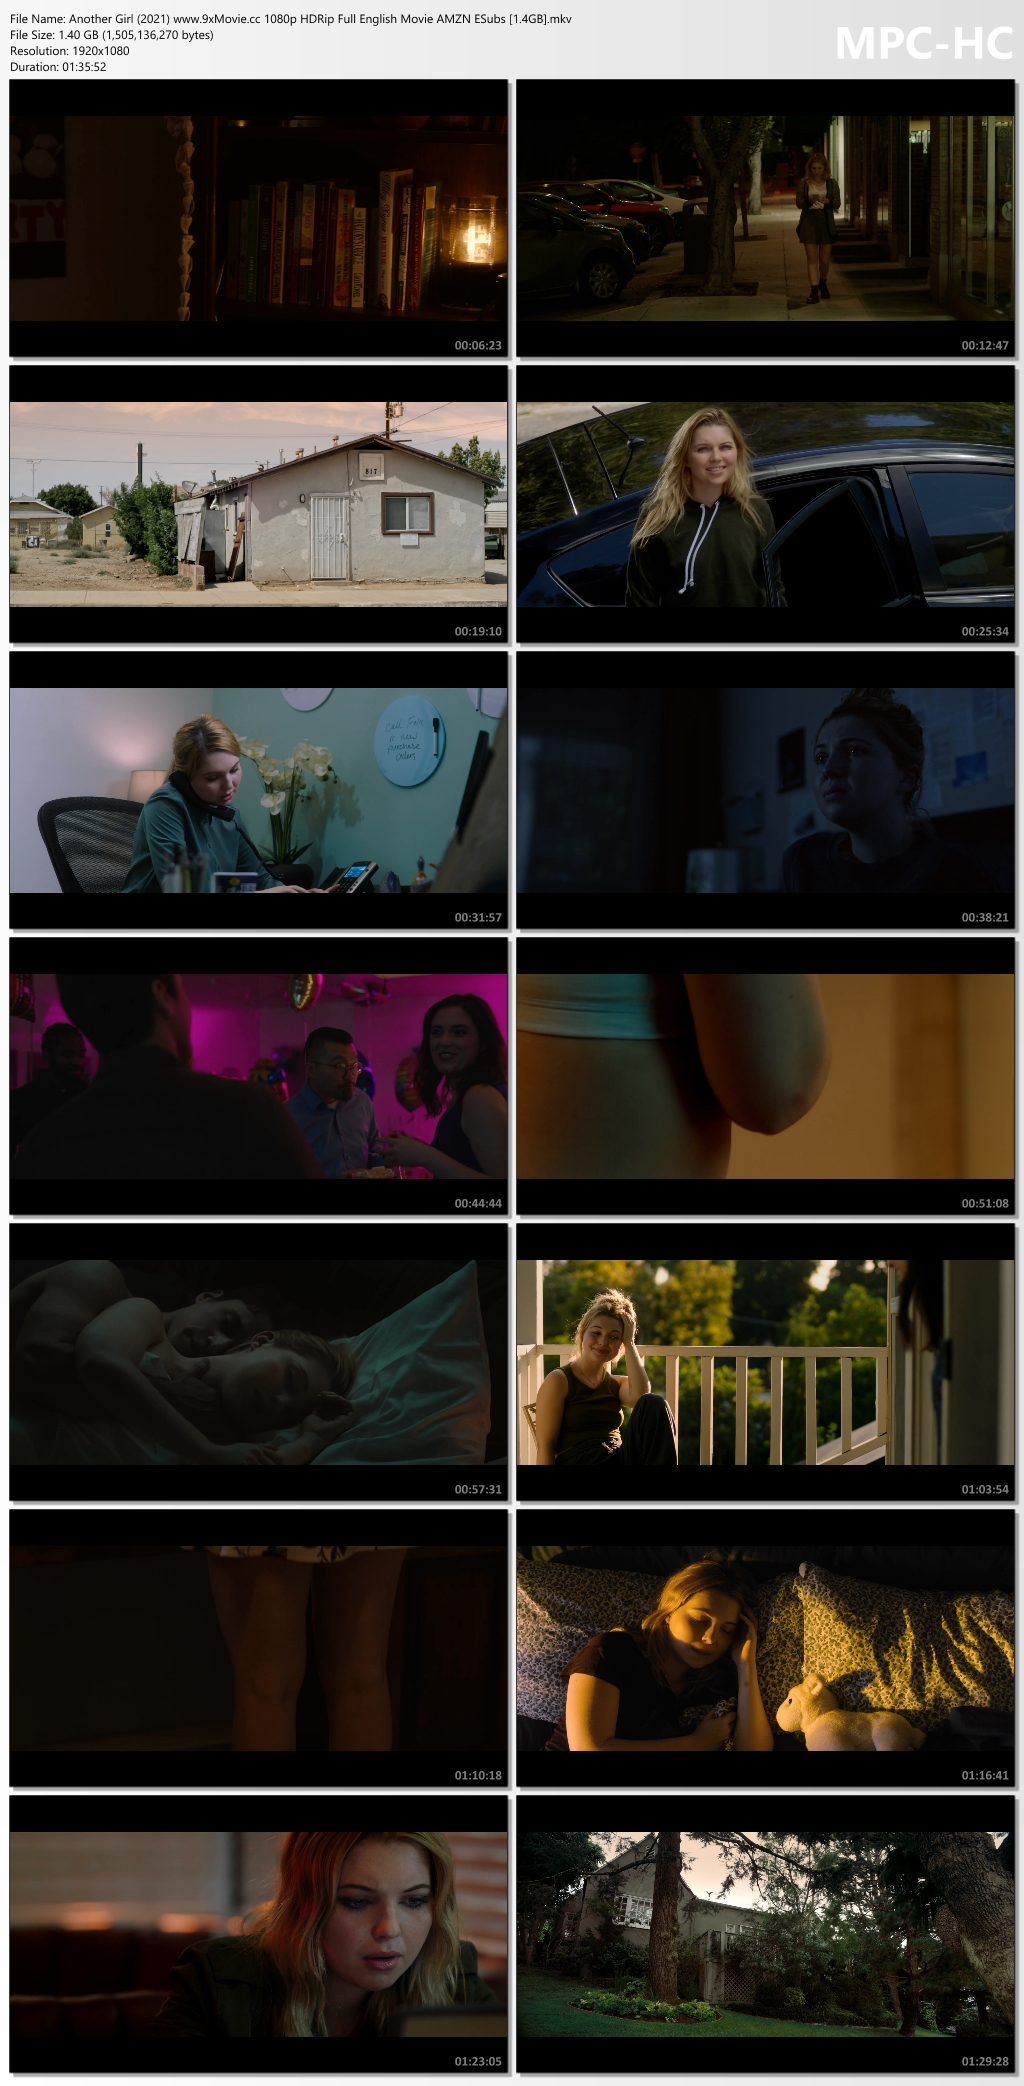 Another-Girl-2021-www-9x-Movie-cc-1080p-HDRip-Full-English-Movie-AMZN-ESubs-1-4-GB-mkv